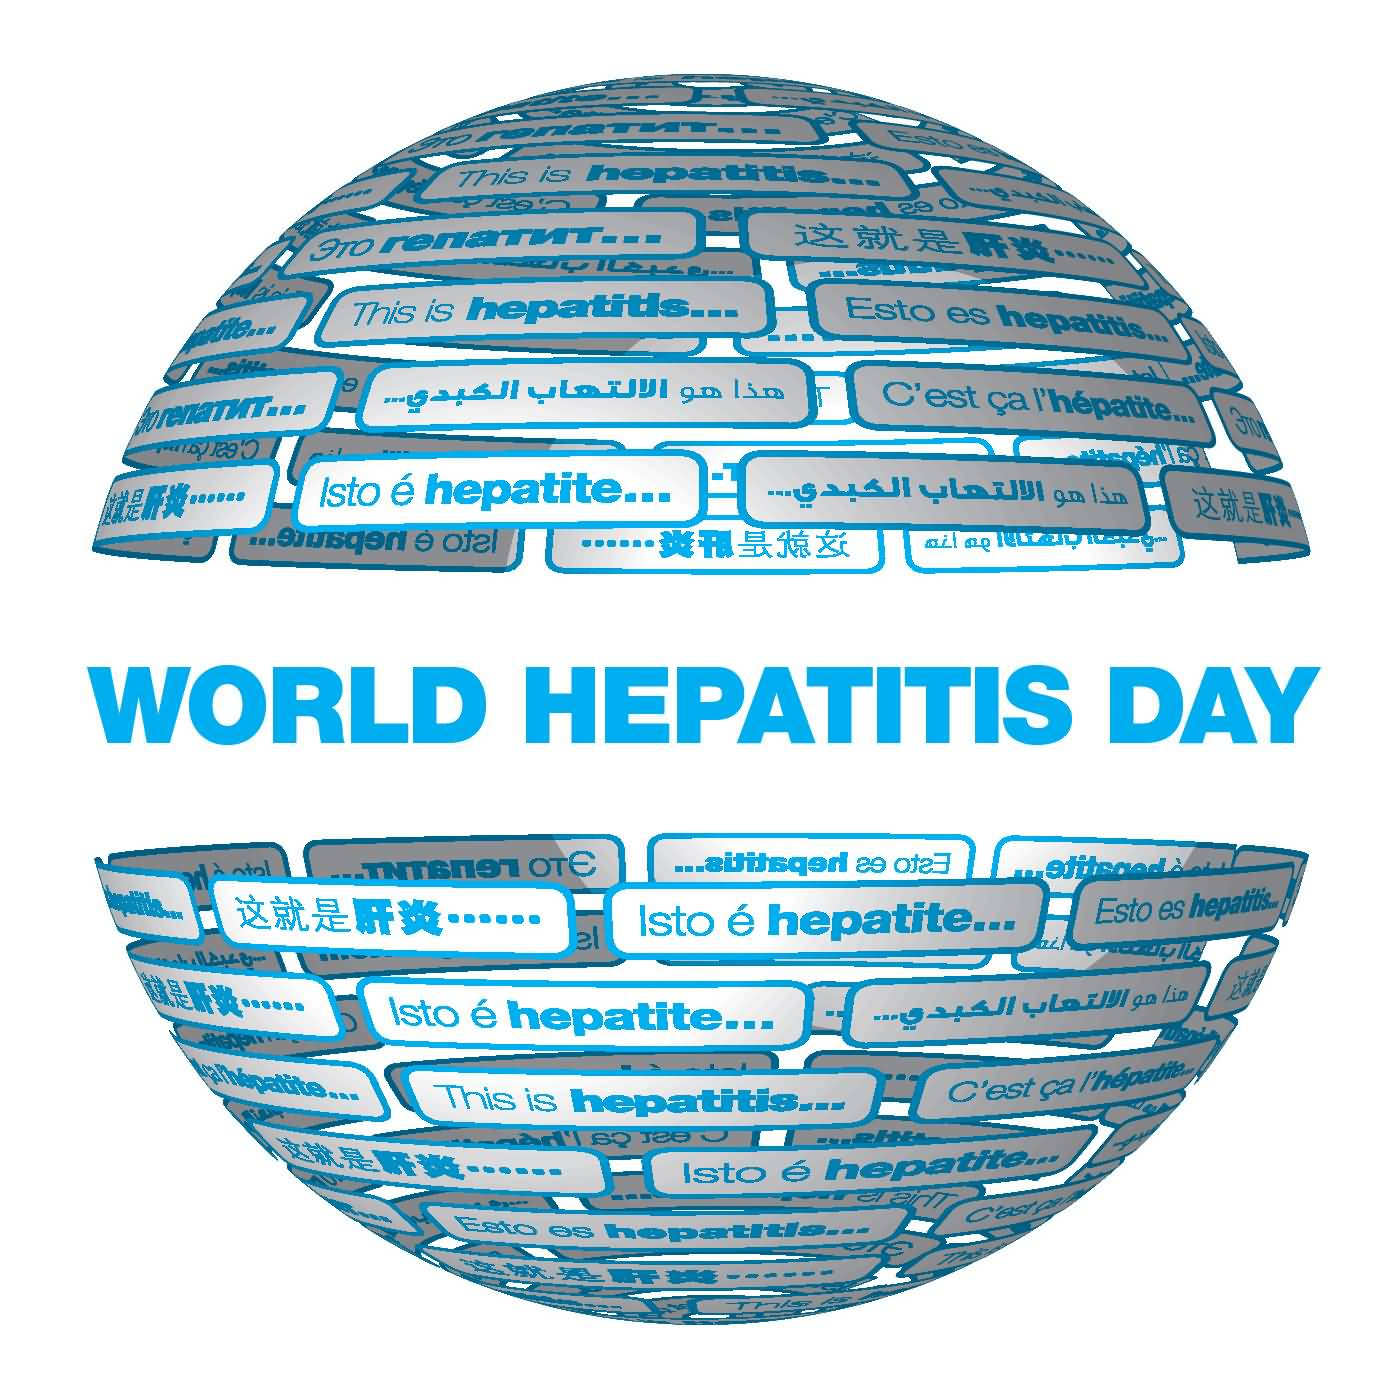 World Hepatitis Day Globe Picture